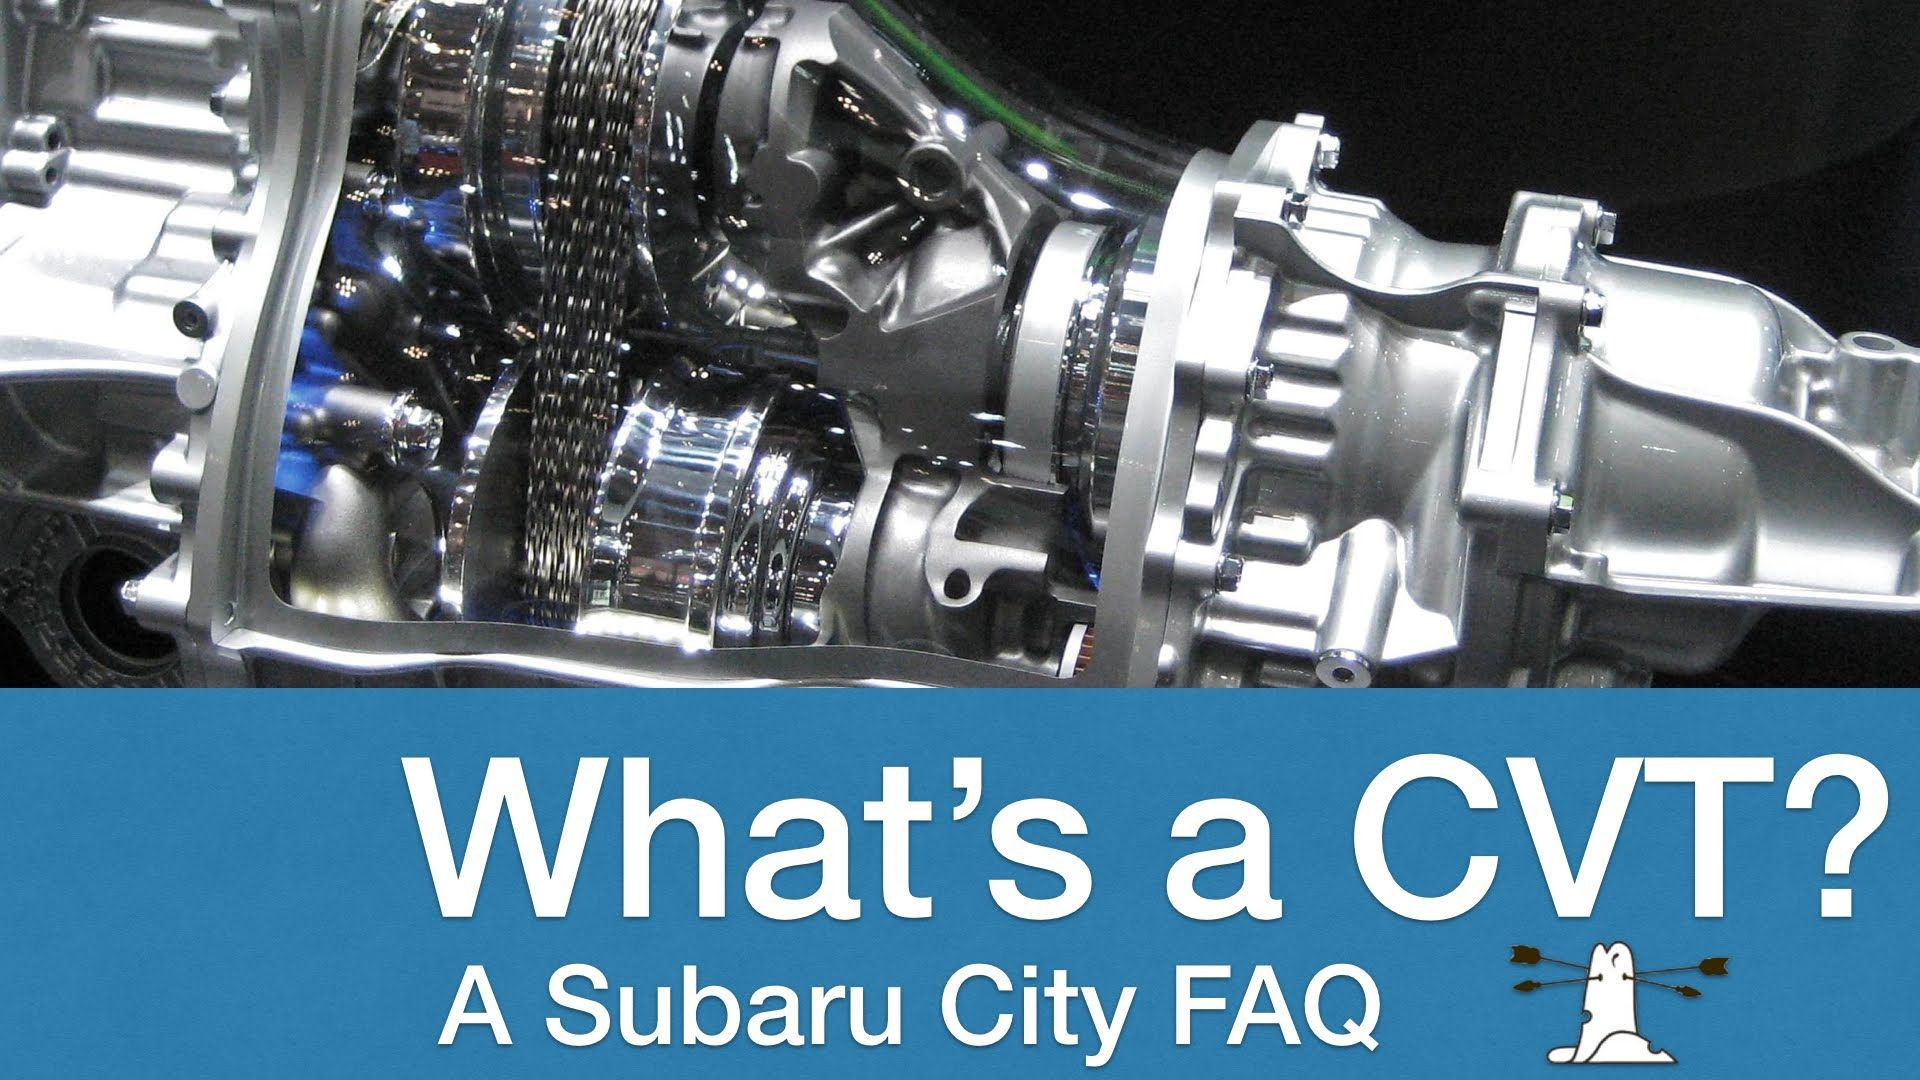 Subaru CVT Automatic Transmission An explainer Subaru